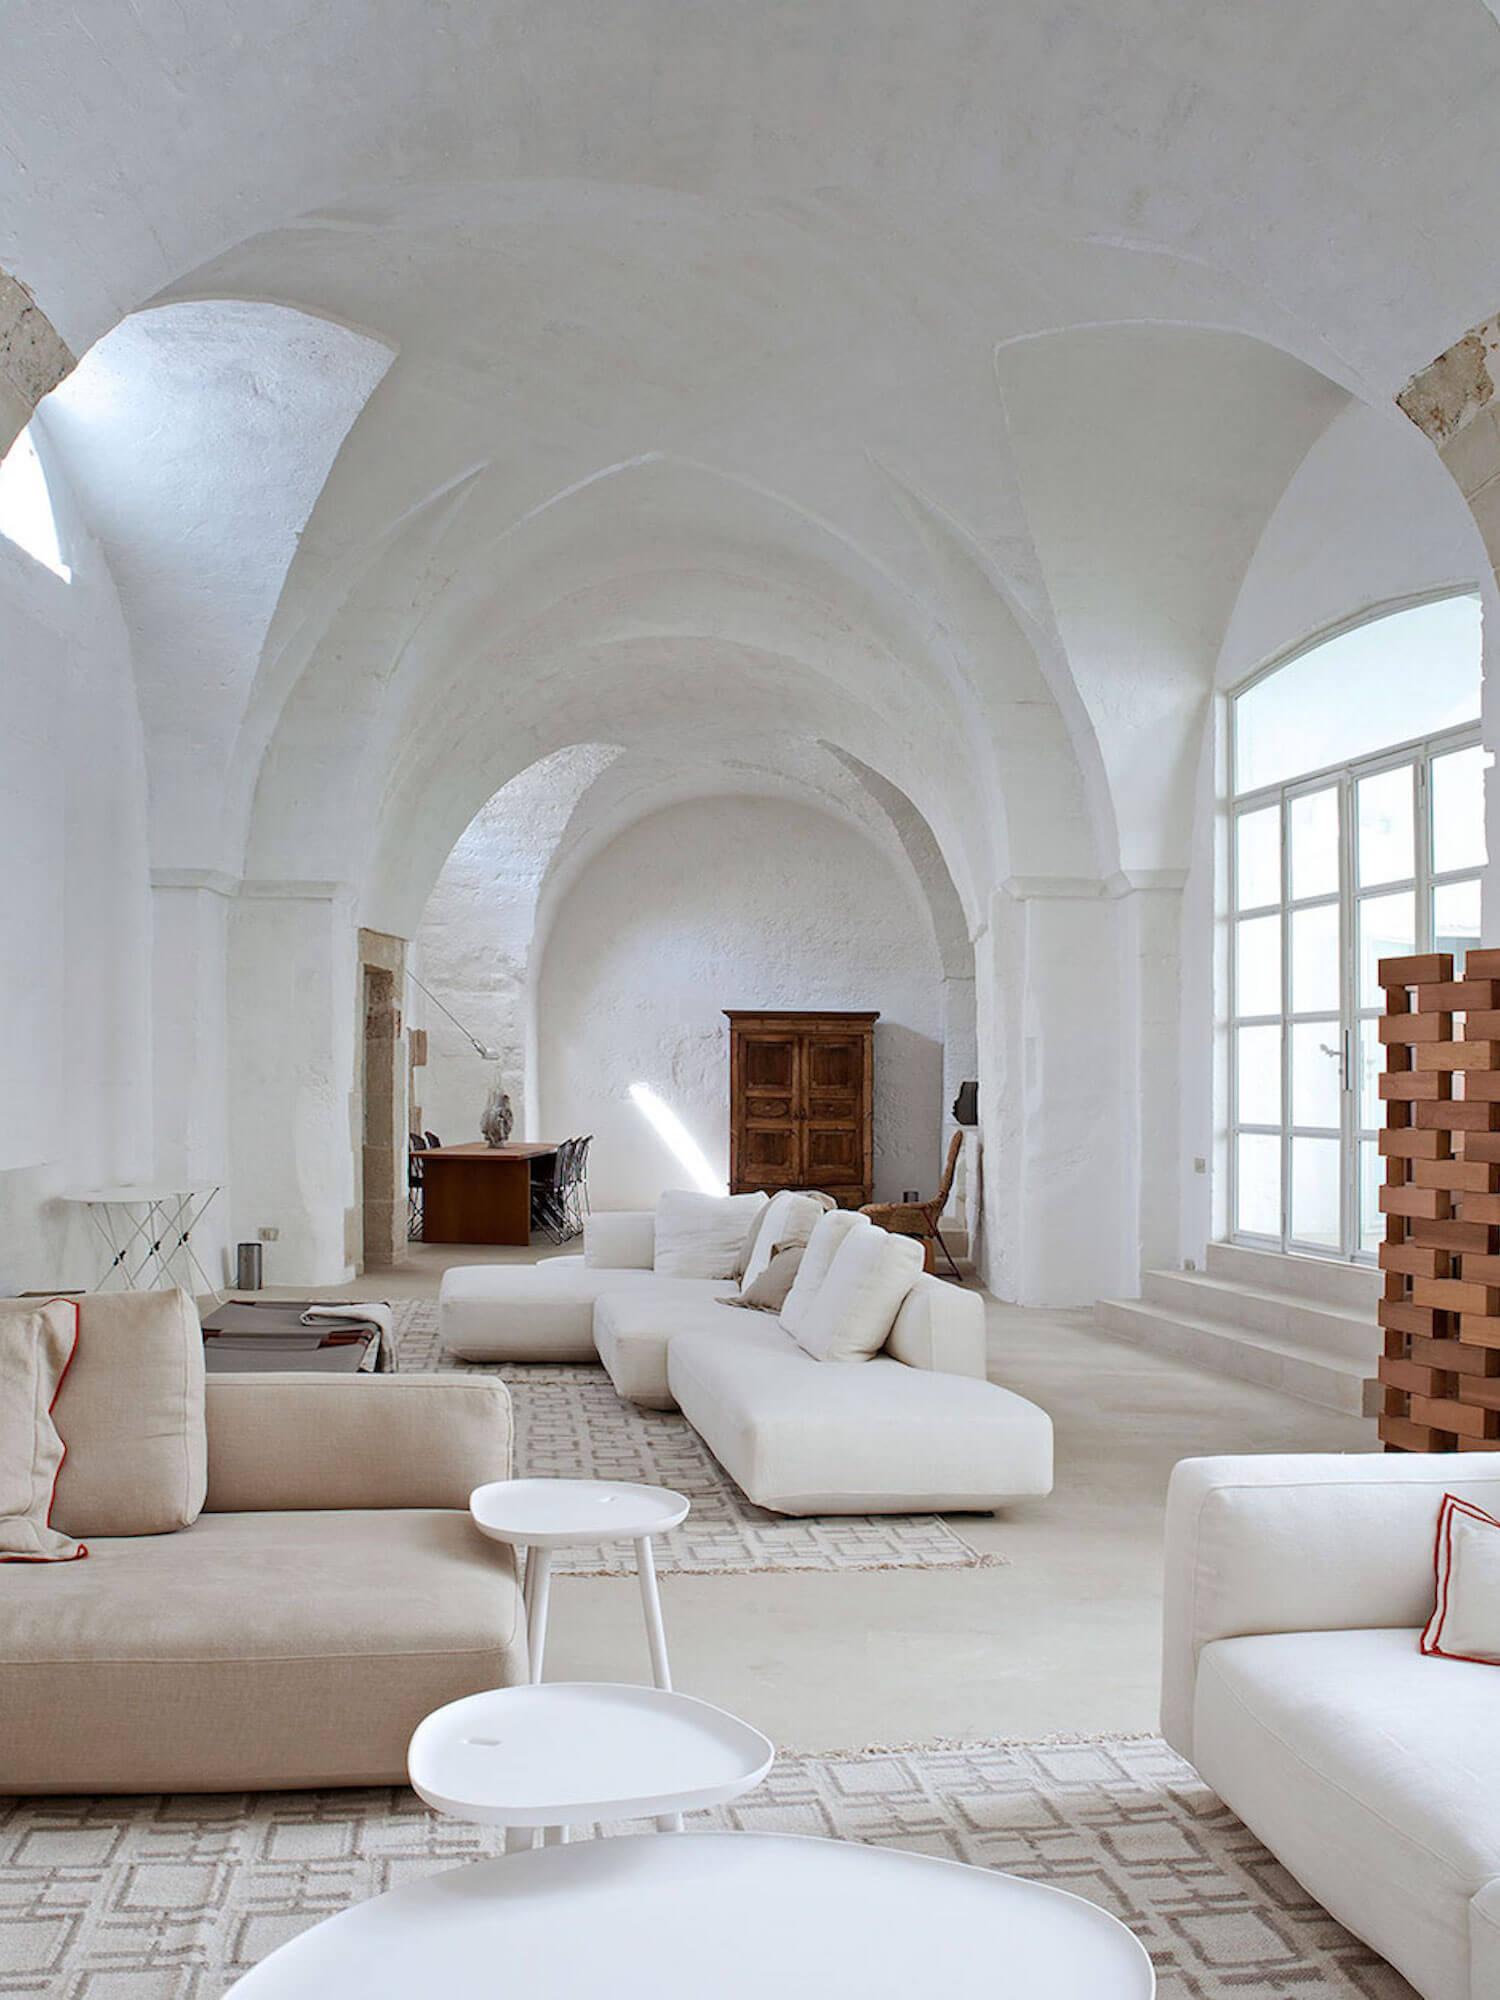 An Italian Country House